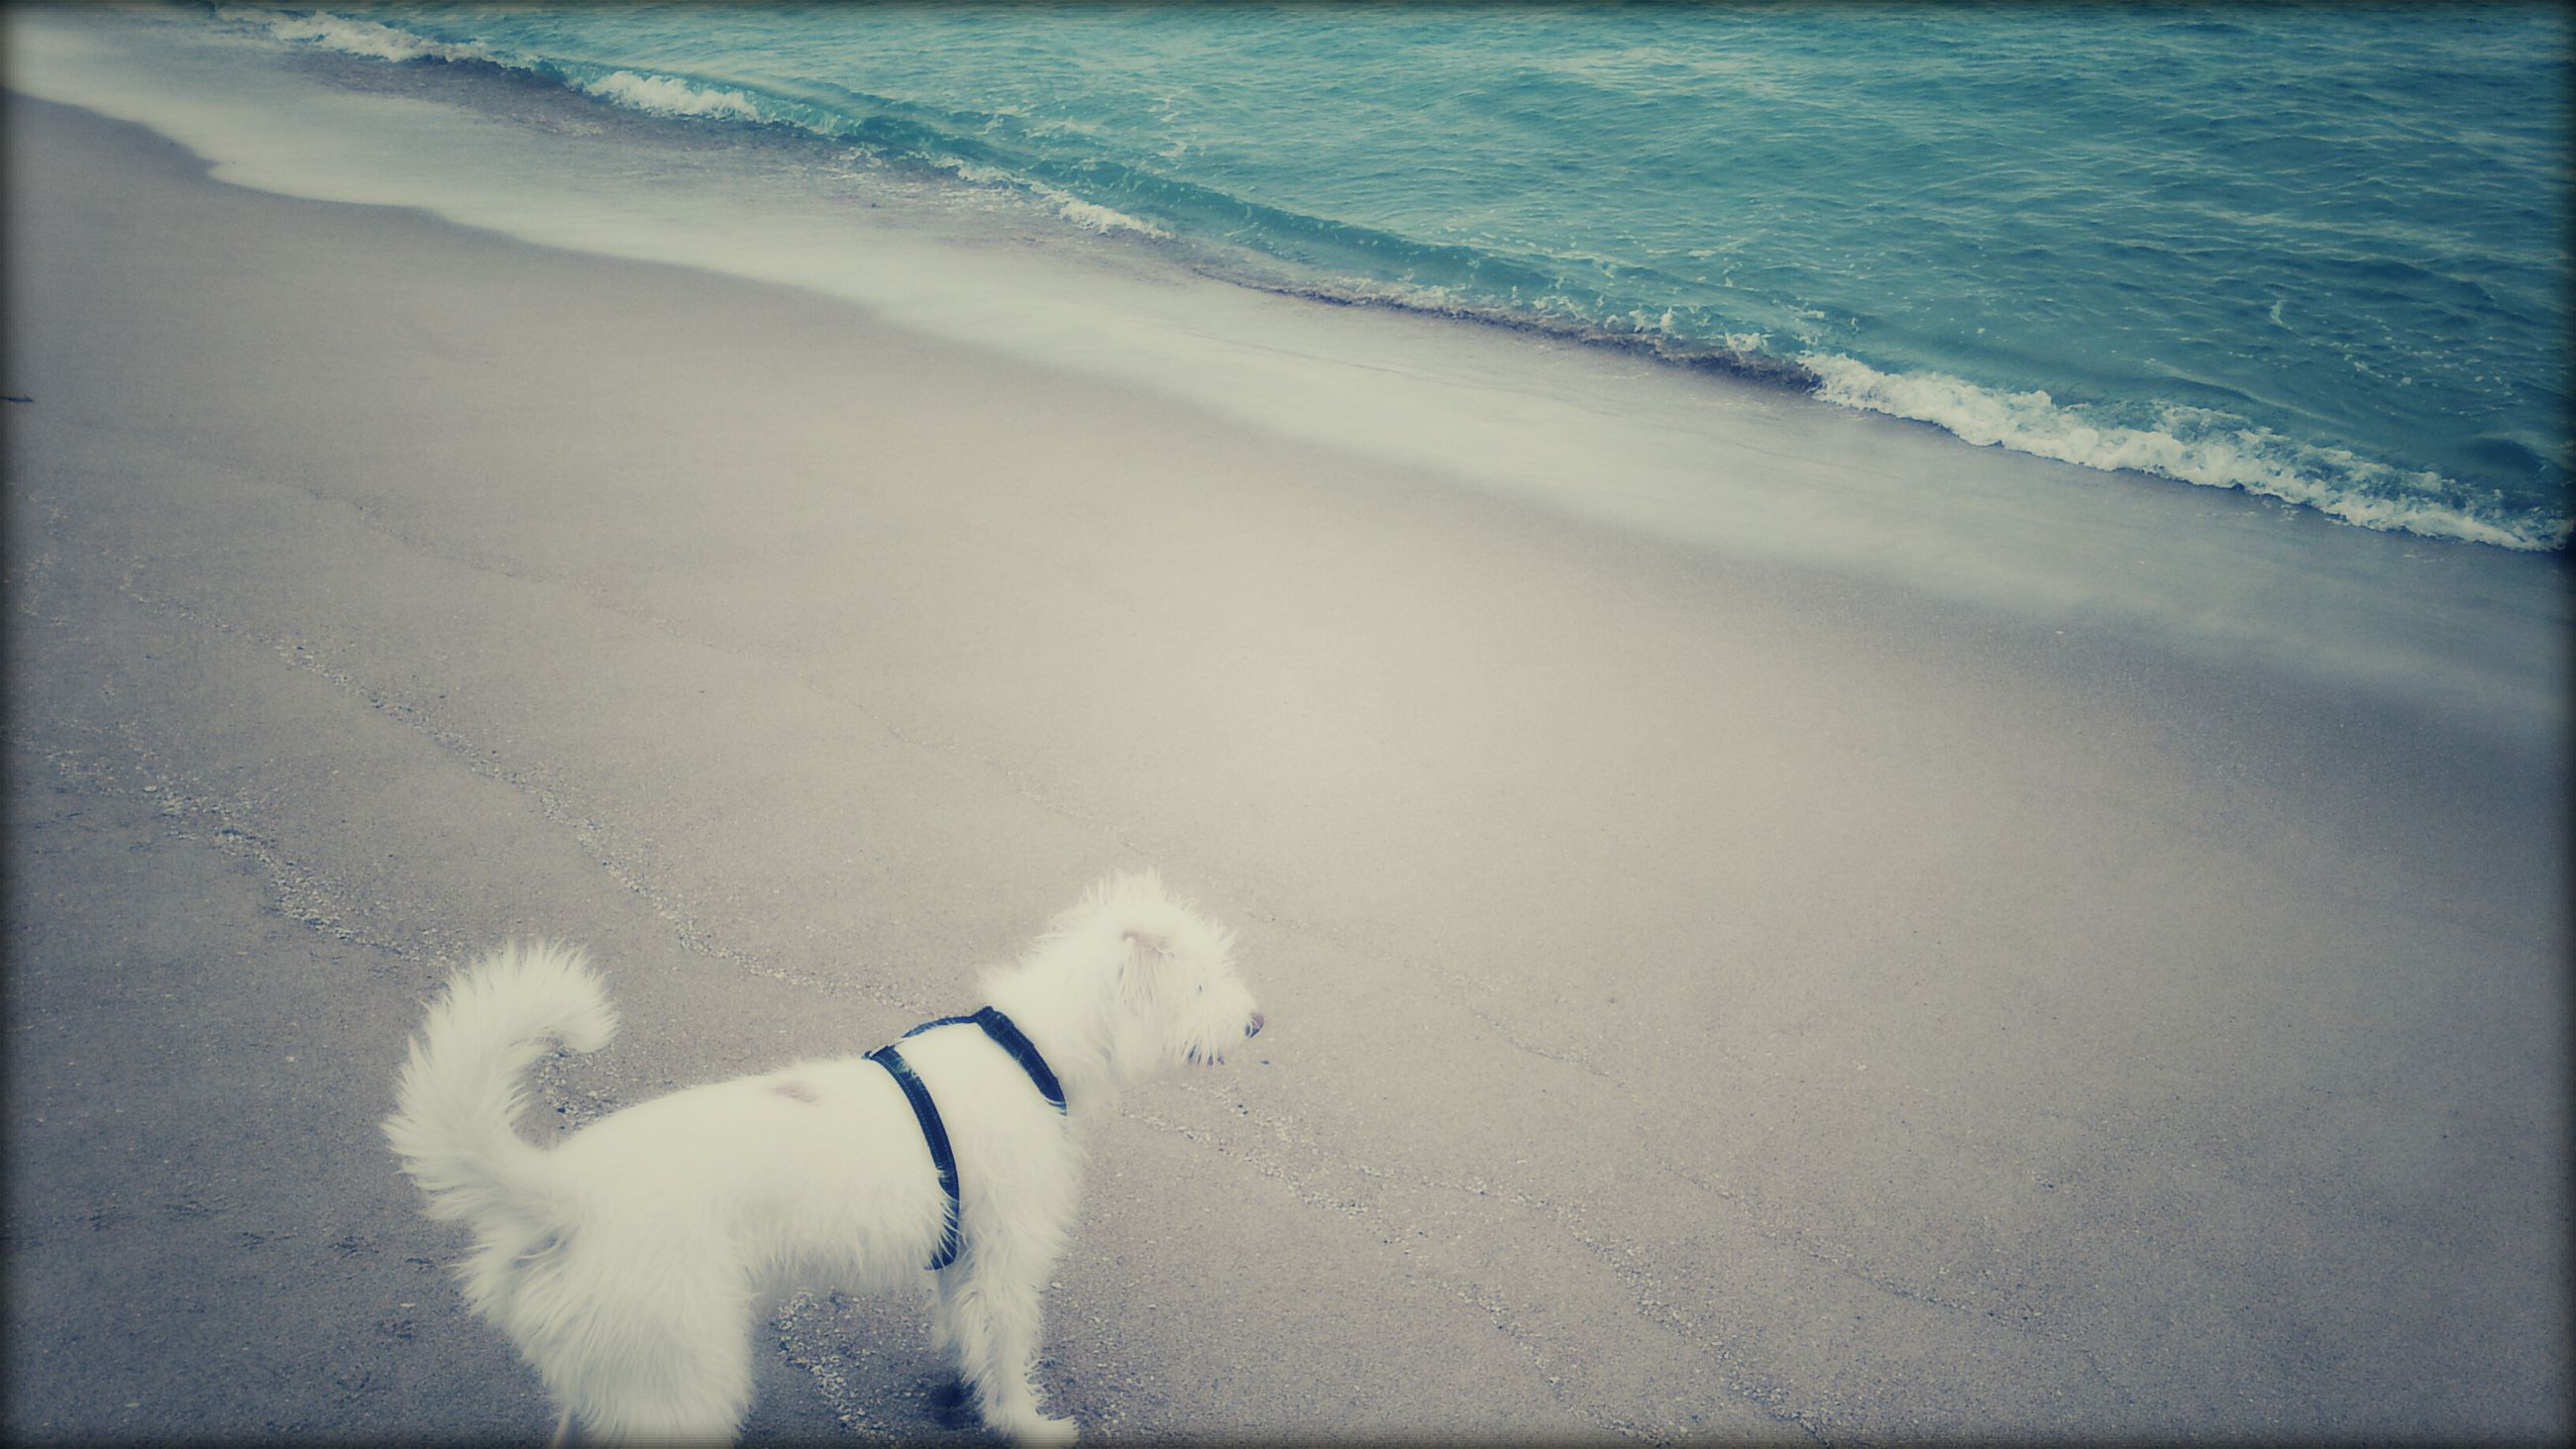 beach, sand, high angle view, dog, pets, lifestyles, sea, leisure activity, domestic animals, shore, mammal, shadow, animal themes, one animal, water, sunlight, men, full length